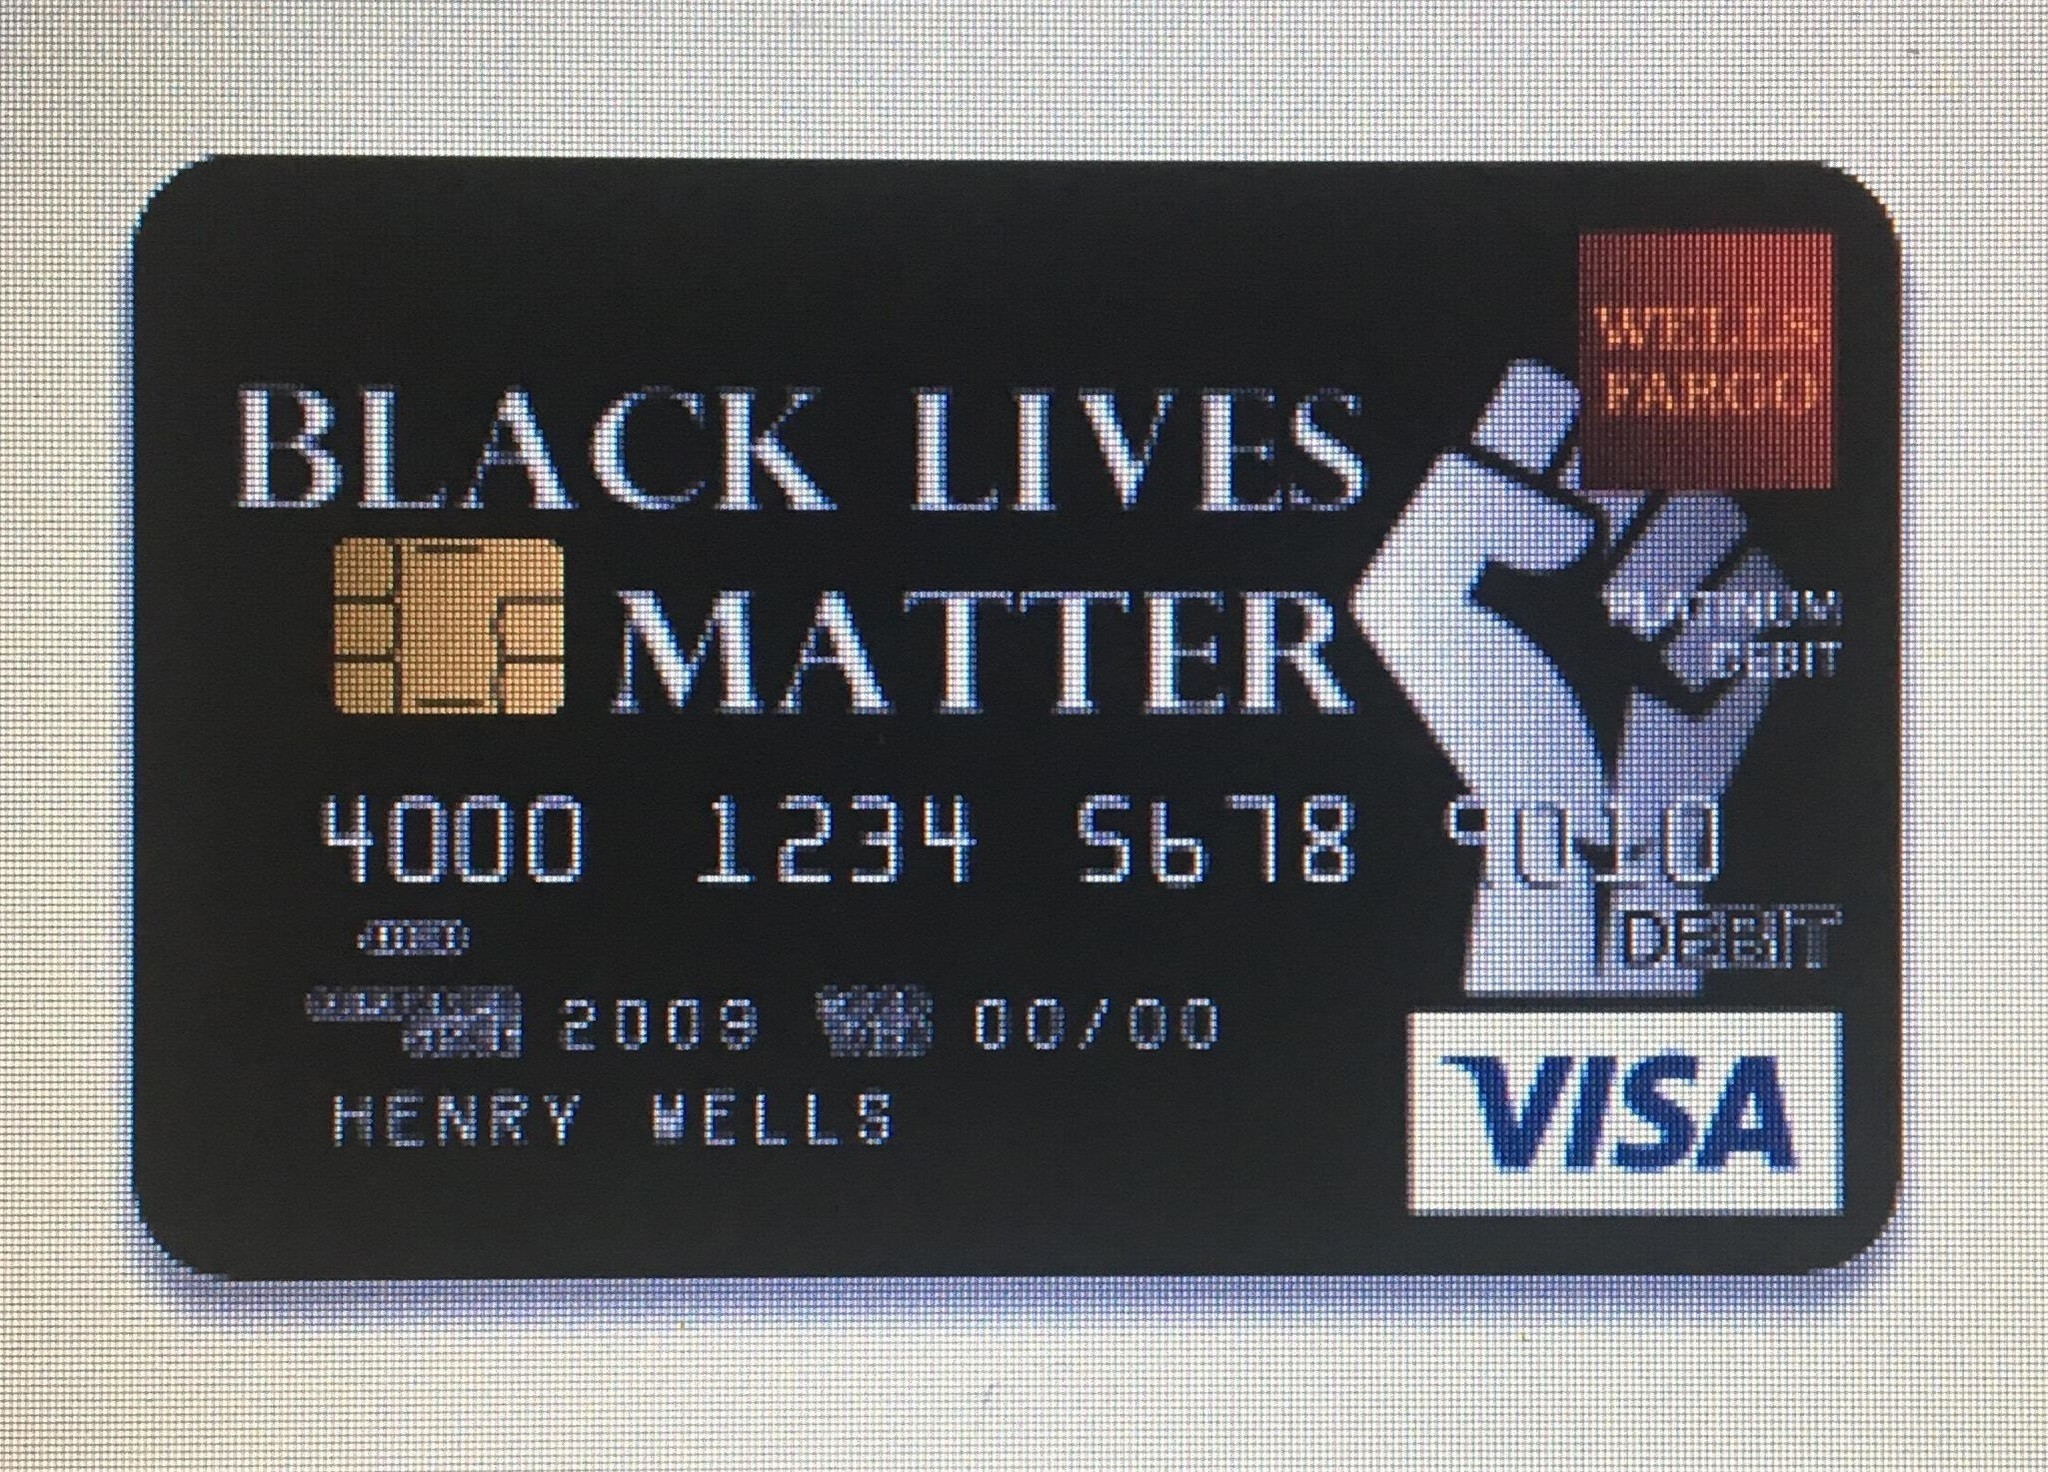 Baltimore teachers black lives matter debit card design denied baltimore teachers black lives matter debit card design denied by wells fargo baltimore sun magicingreecefo Choice Image